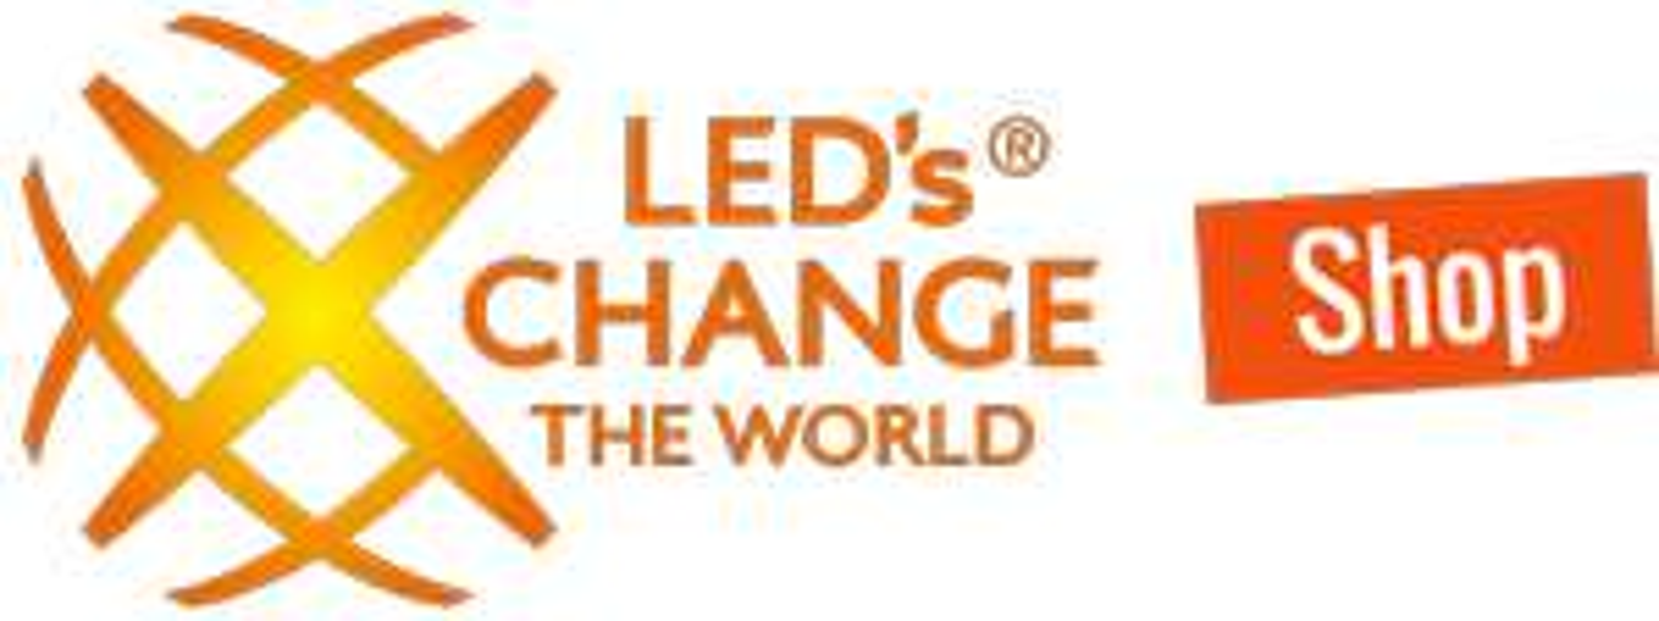 LED-Lampen bis zu 96% reduziert